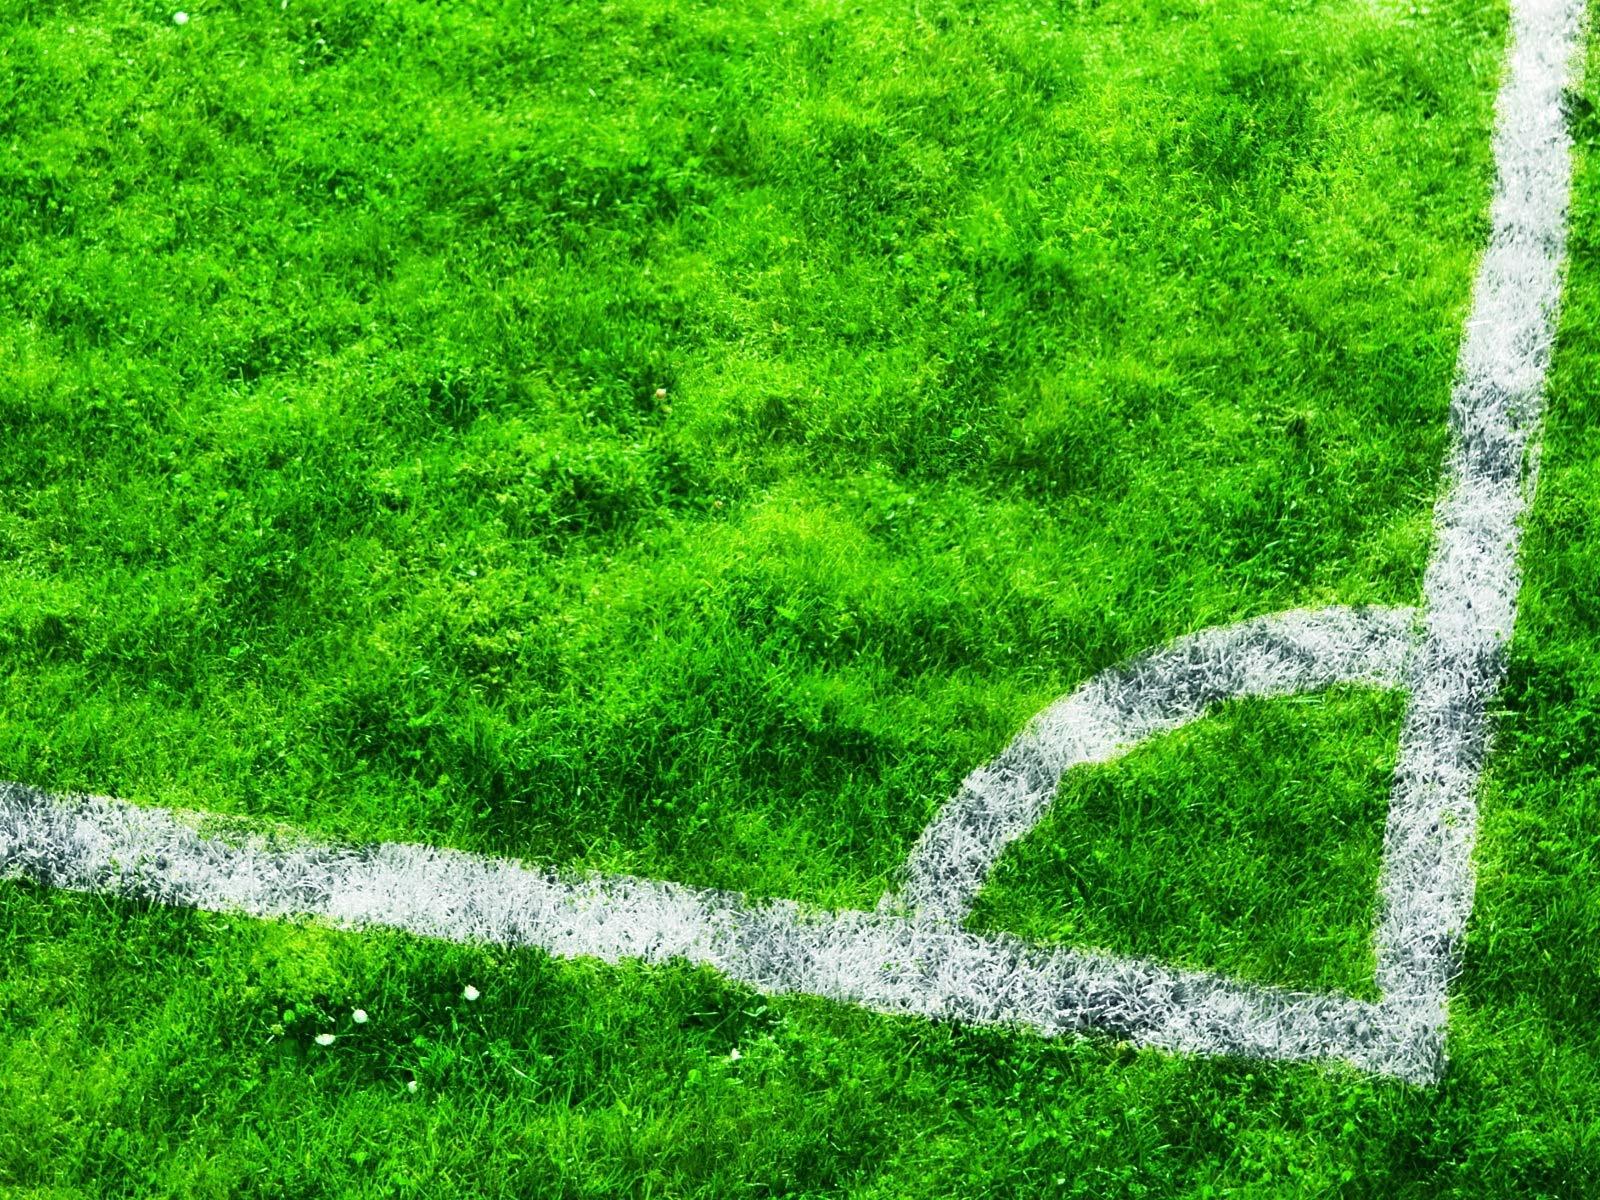 Stadium Soccer Football Sports Qhd Wallpaper 2560x2560: 배경 화면 축구장, 잔디 1920x1200 HD 그림, 이미지